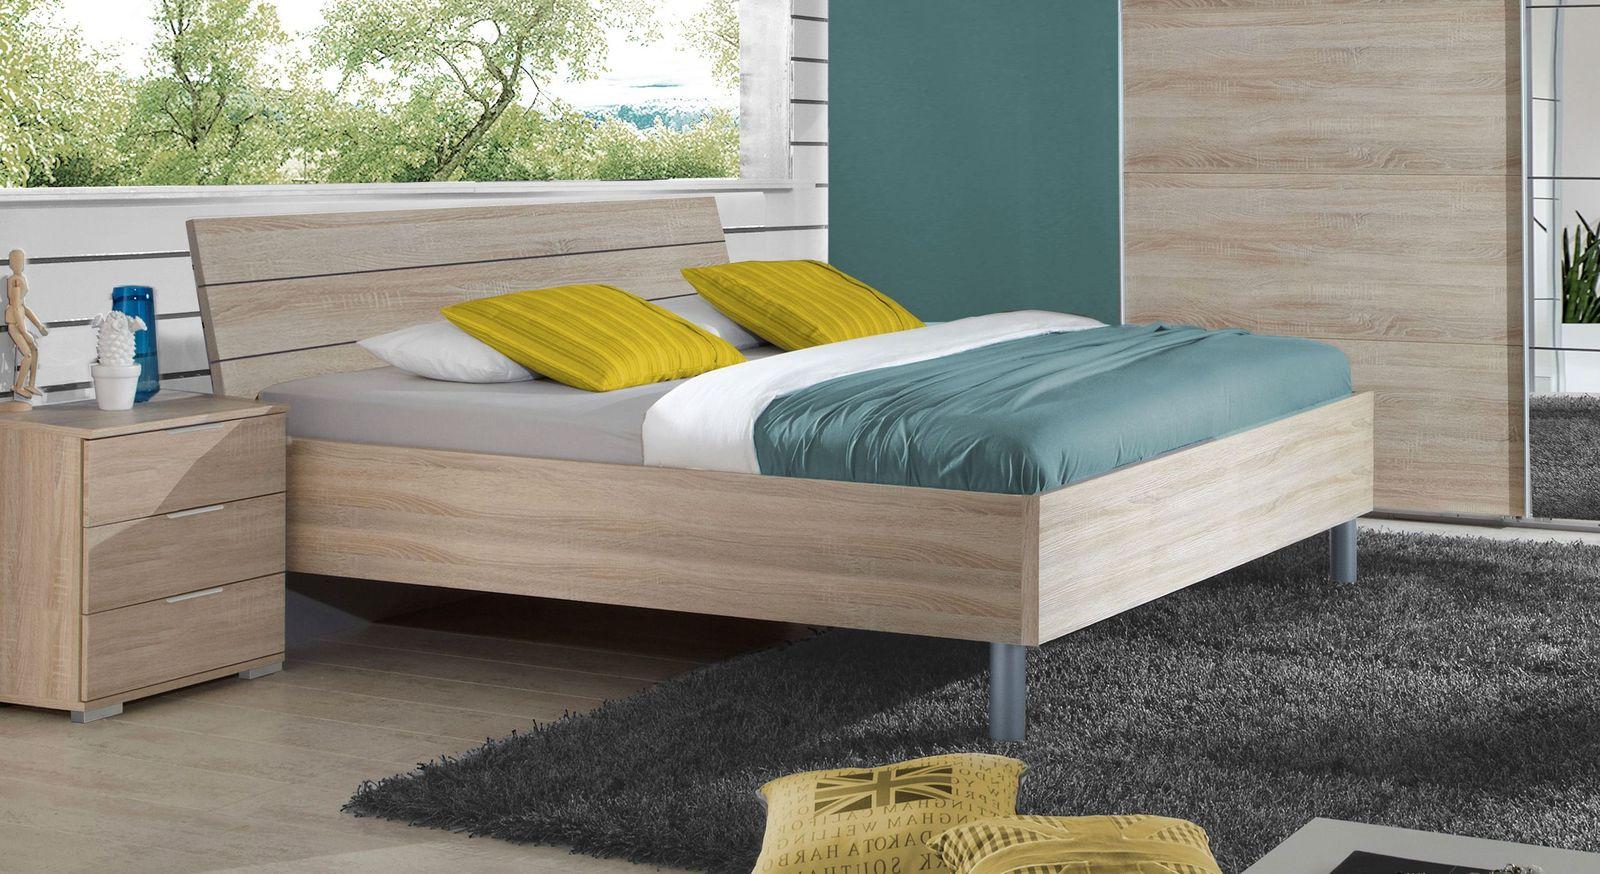 g nstiges bett eiche s gerau nachbildung h he w hlbar turania. Black Bedroom Furniture Sets. Home Design Ideas